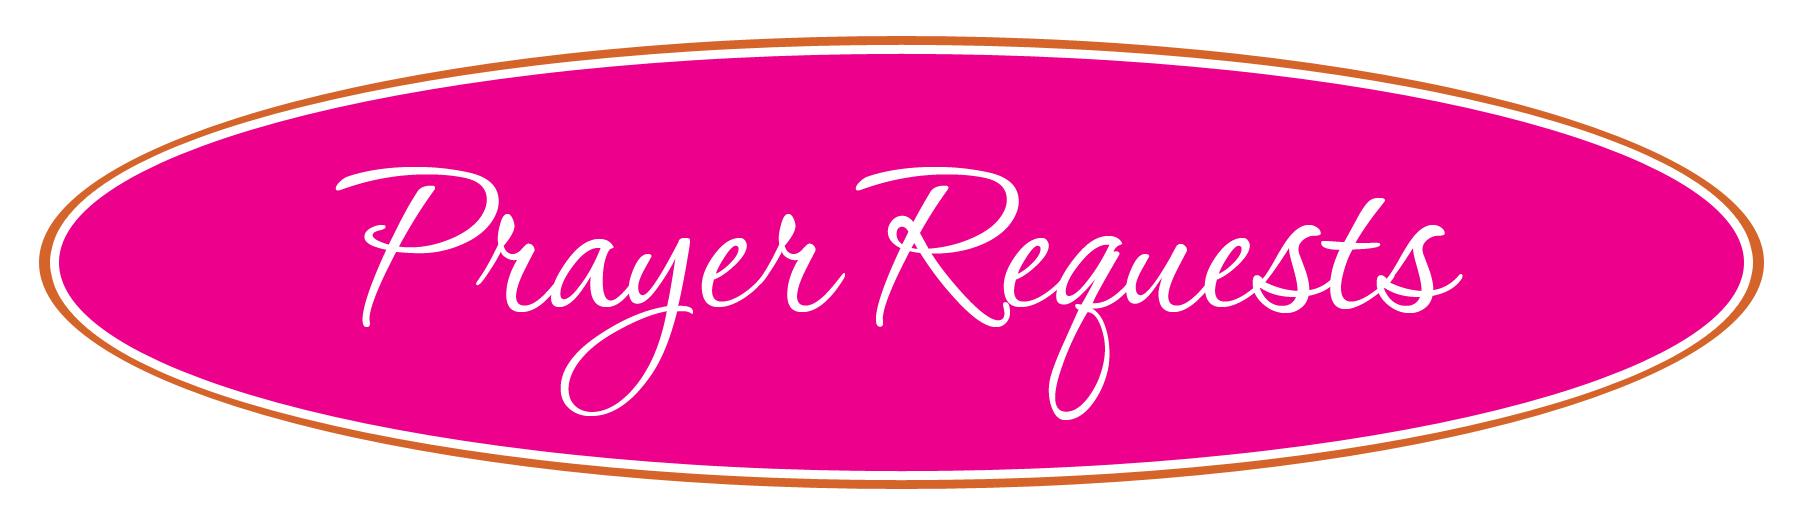 clip art free download Prayer request clipart